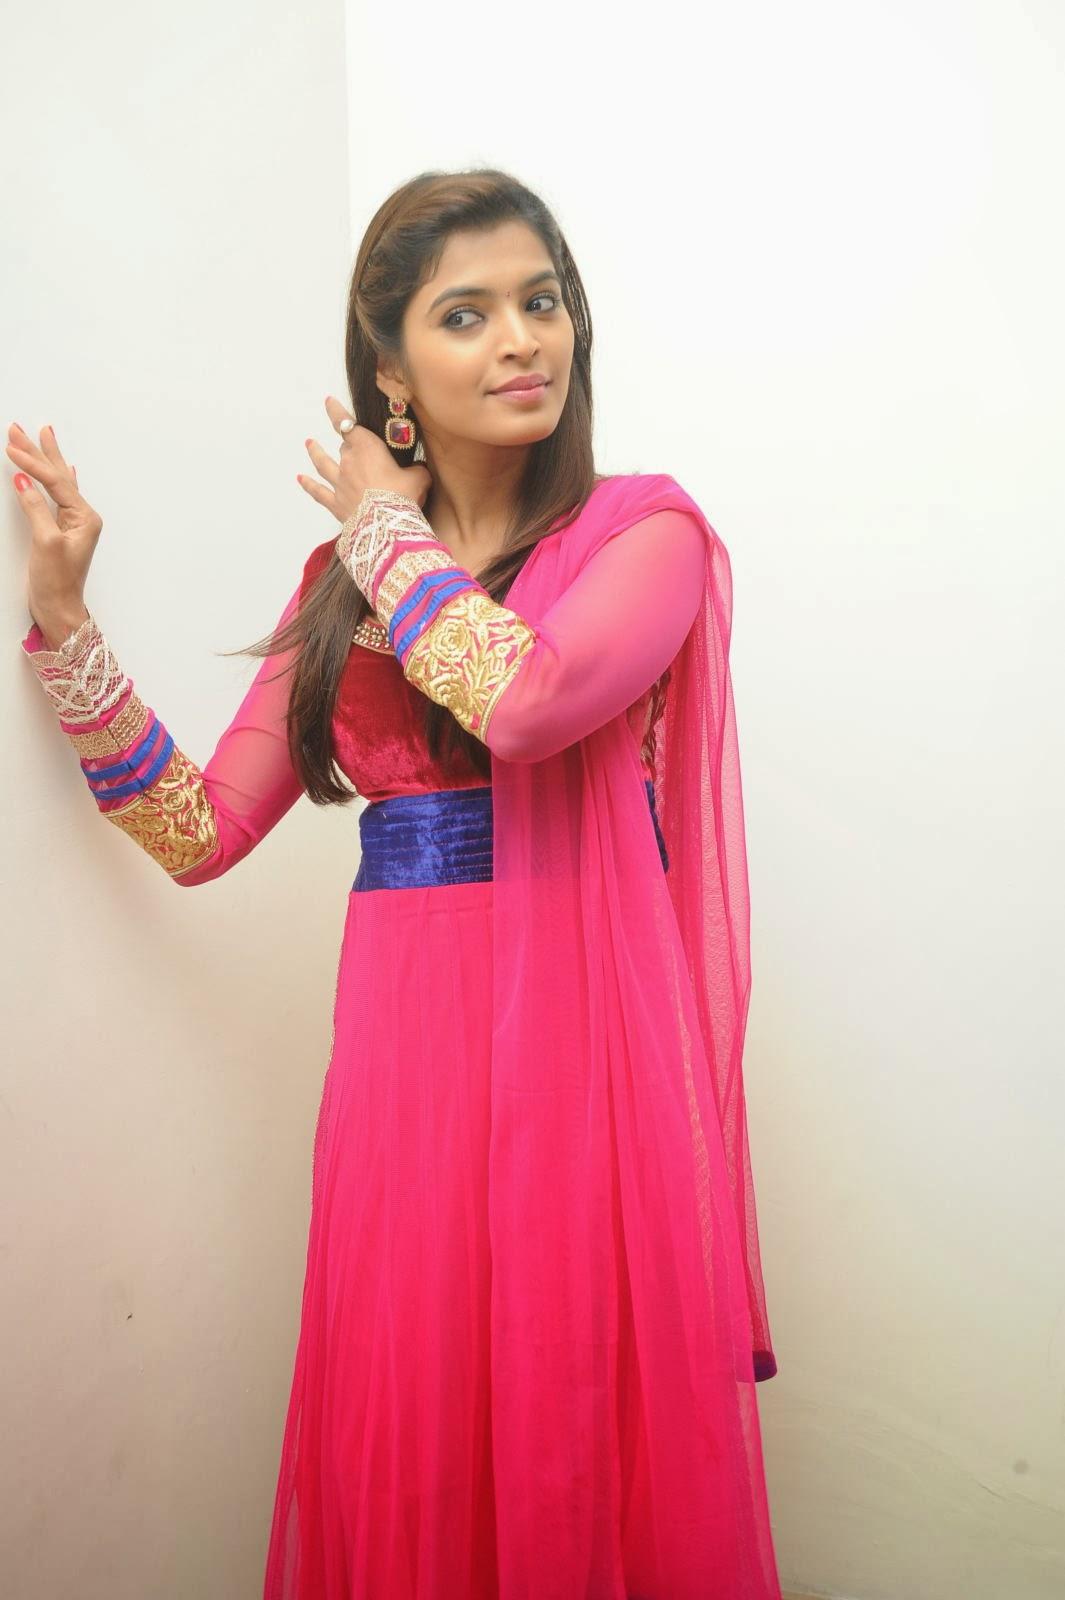 Gorgeous hot Sanchita shetty photos in ethnic red salwar kameez